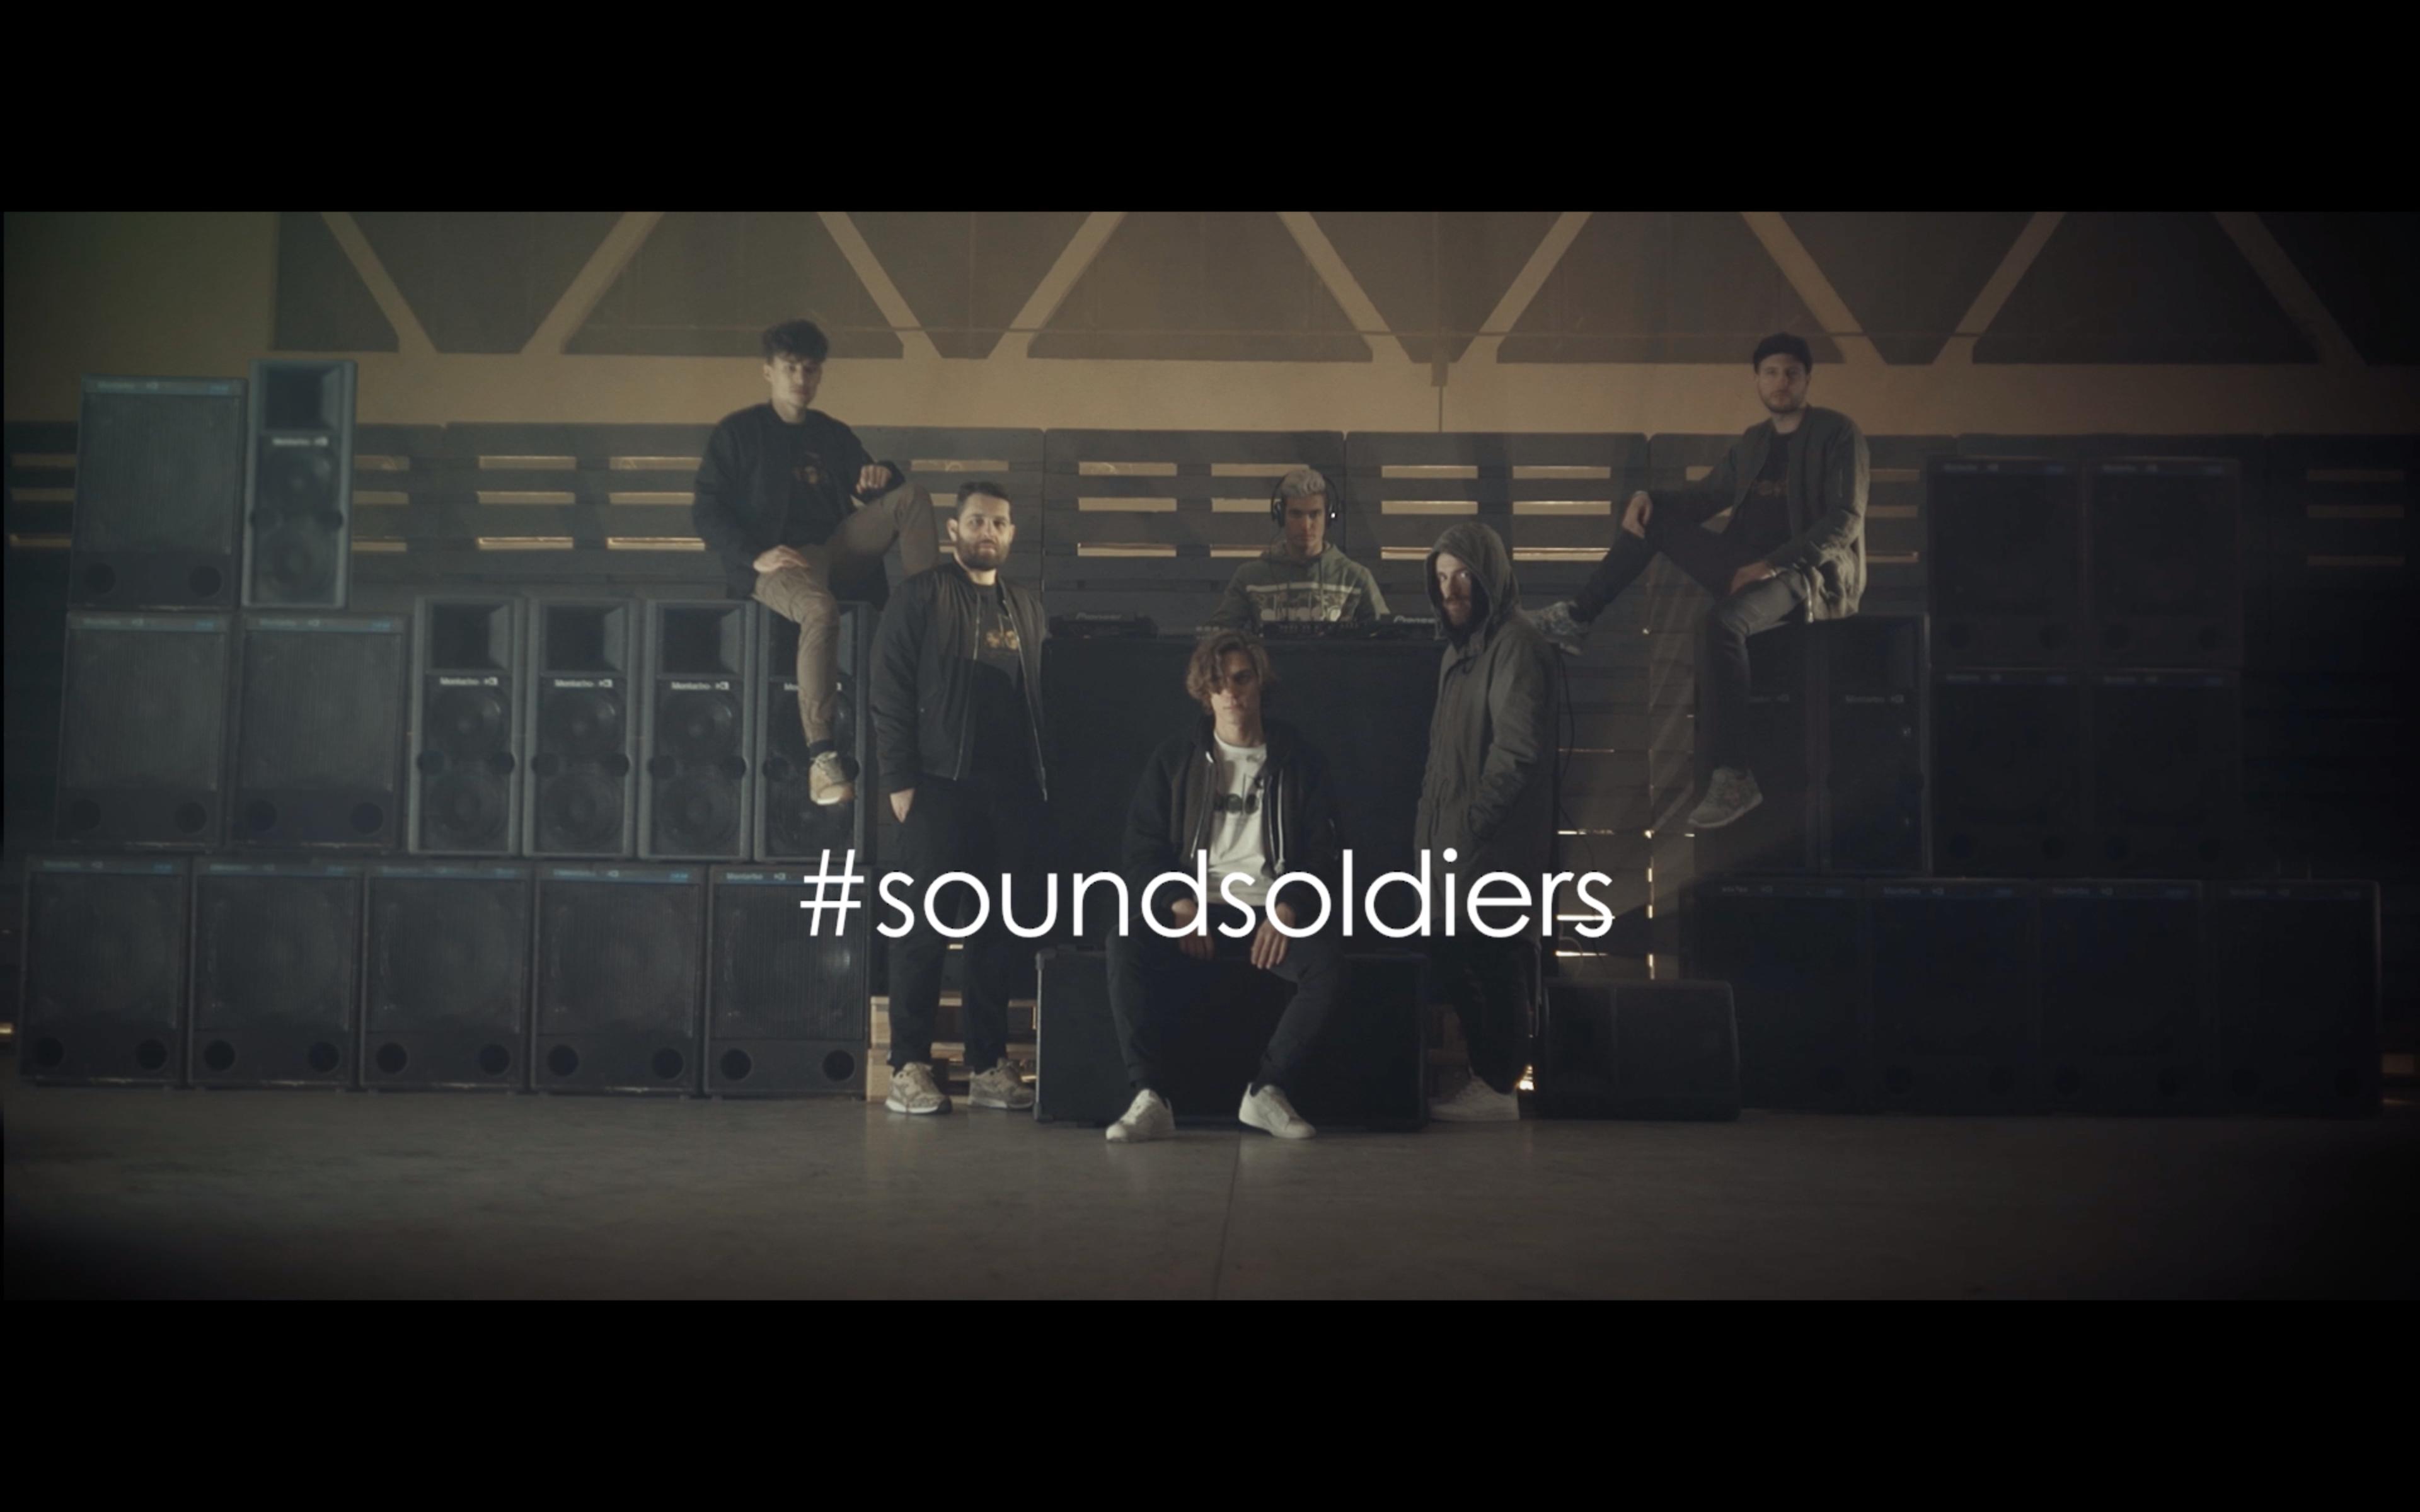 DIADORA - Sound soldiers